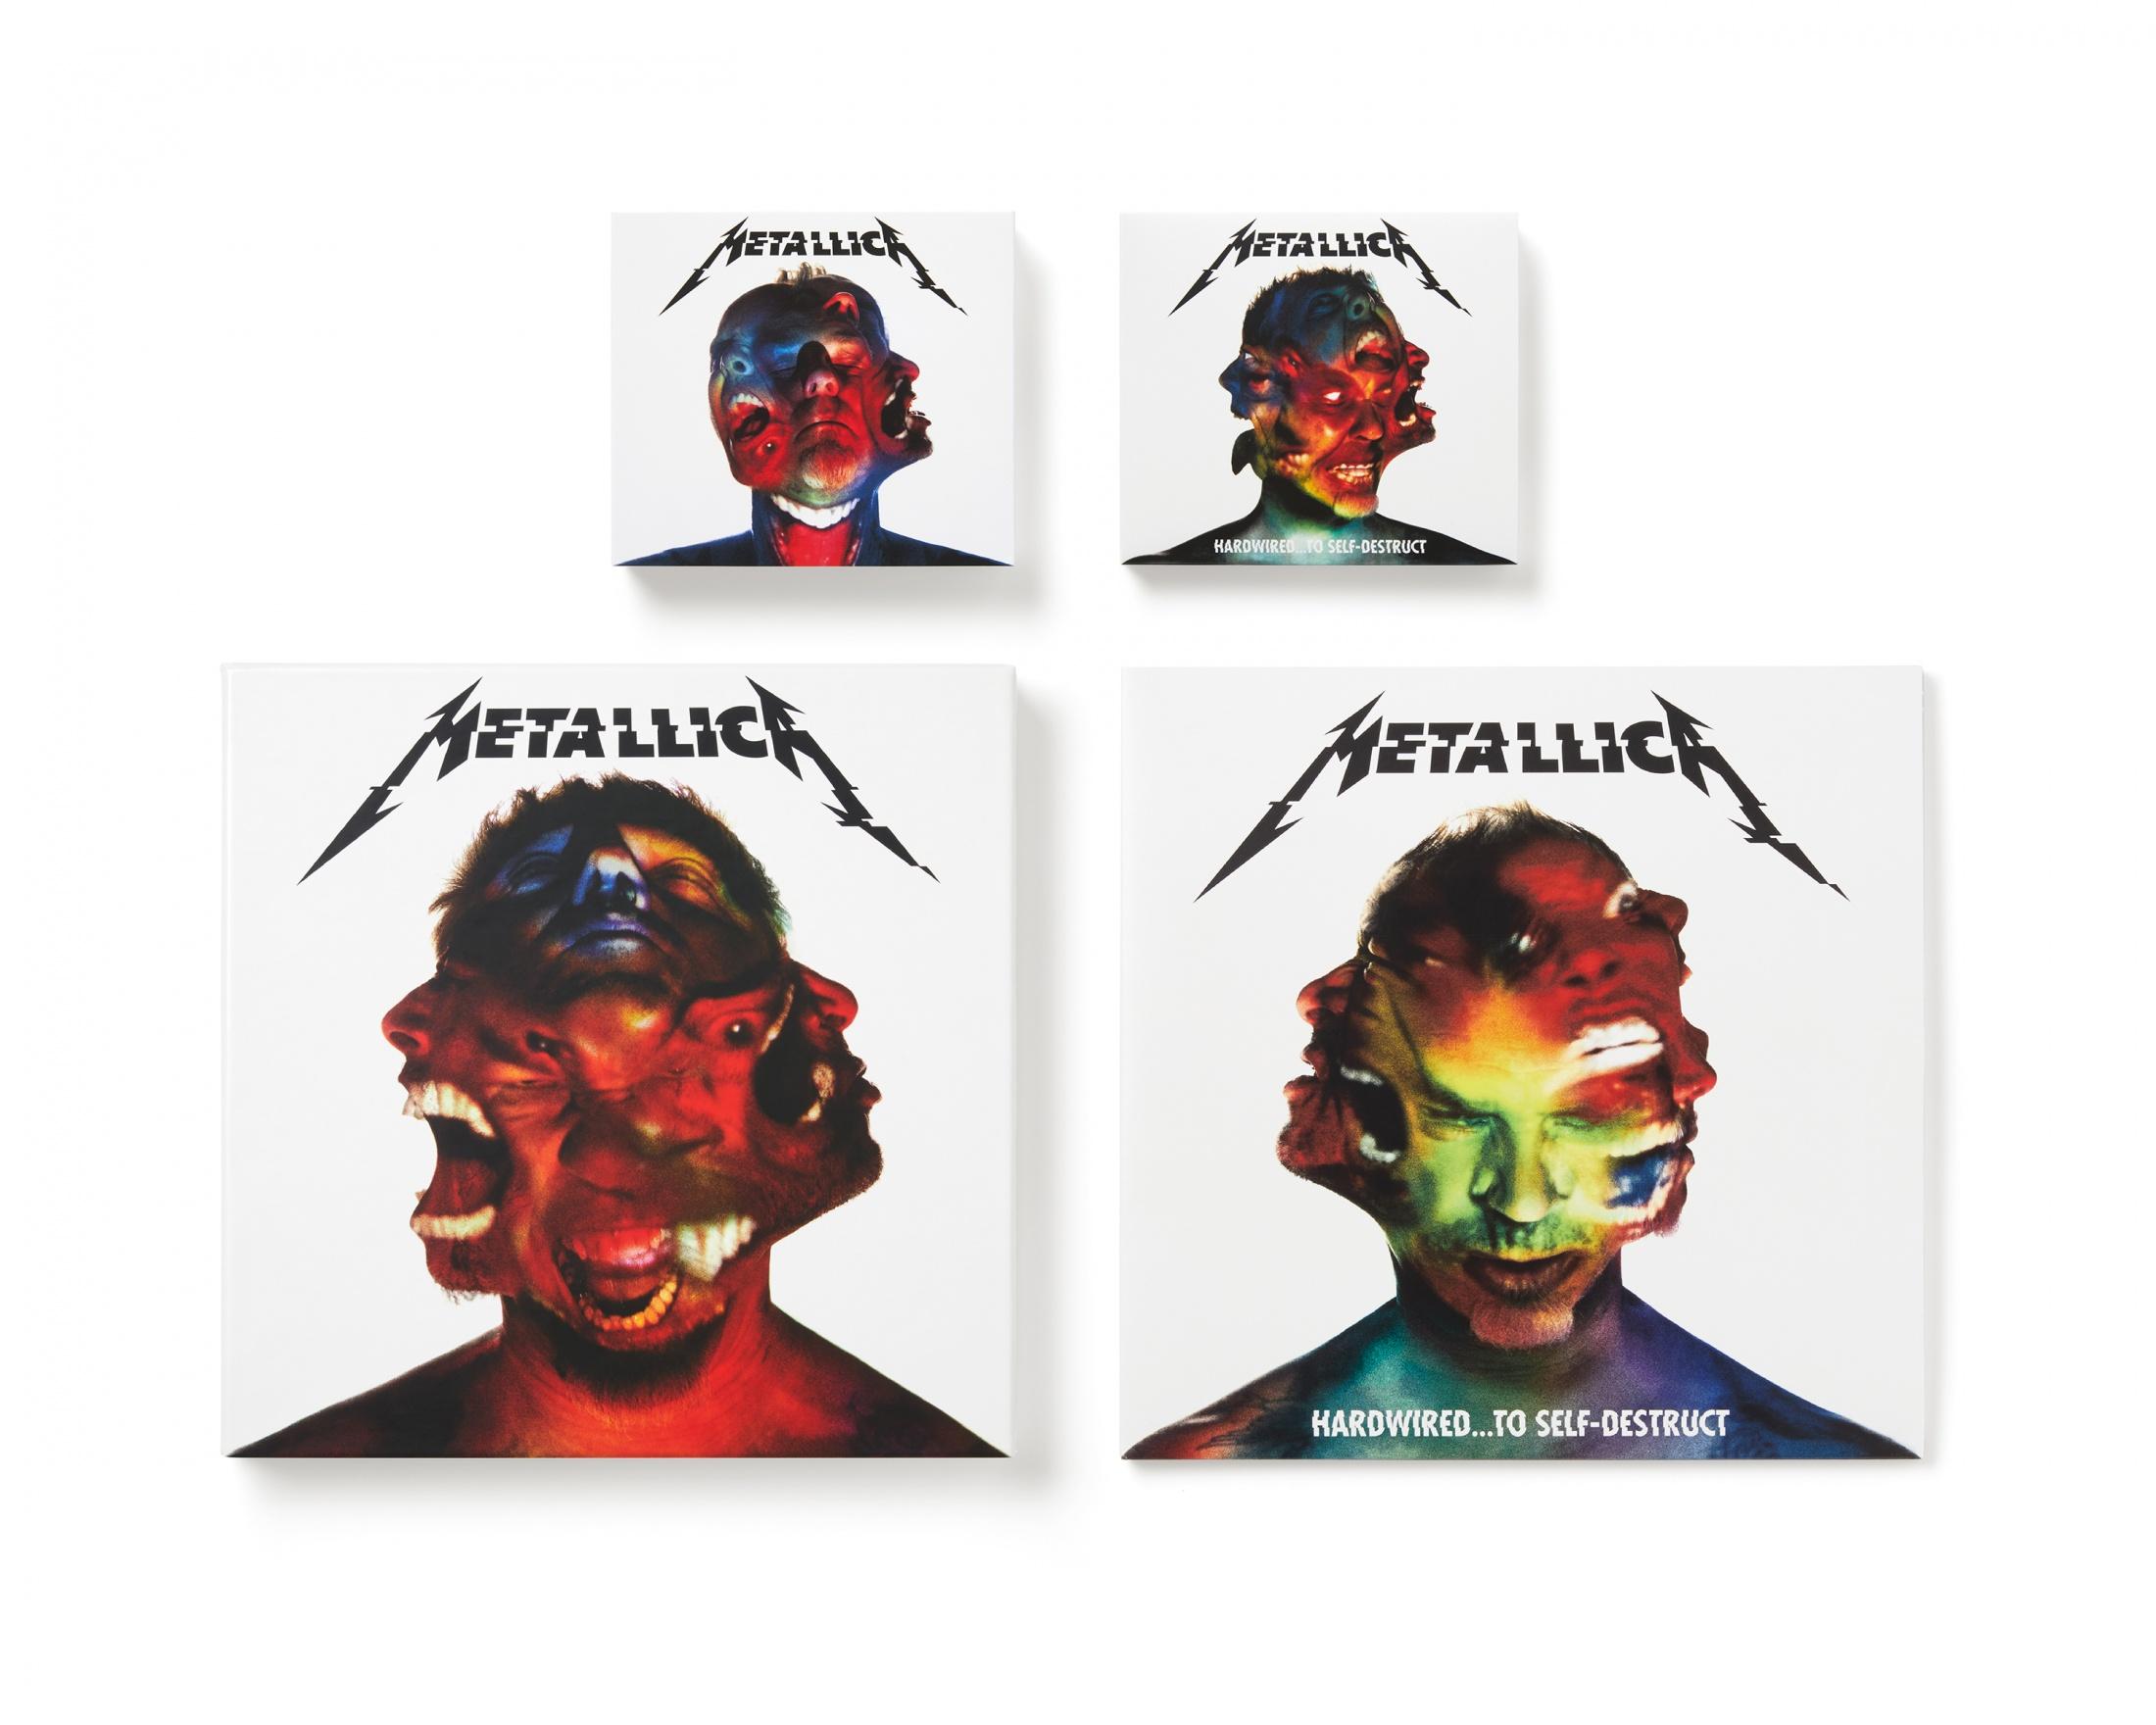 Thumbnail for Metallica Hardwired... to Self-Destruct album design